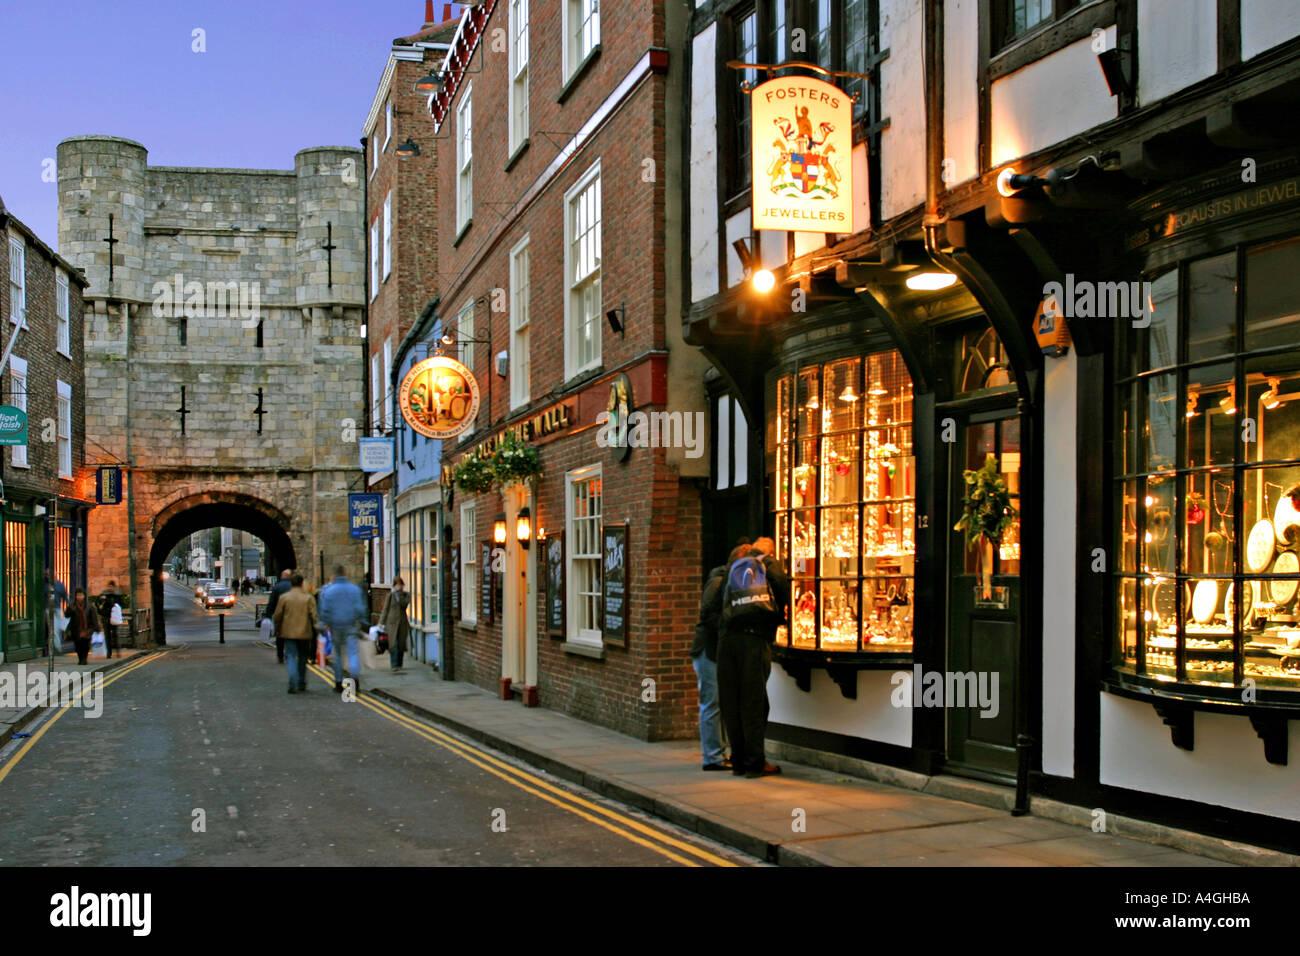 york england uk bootham bar and shops at christmas at dusk stock